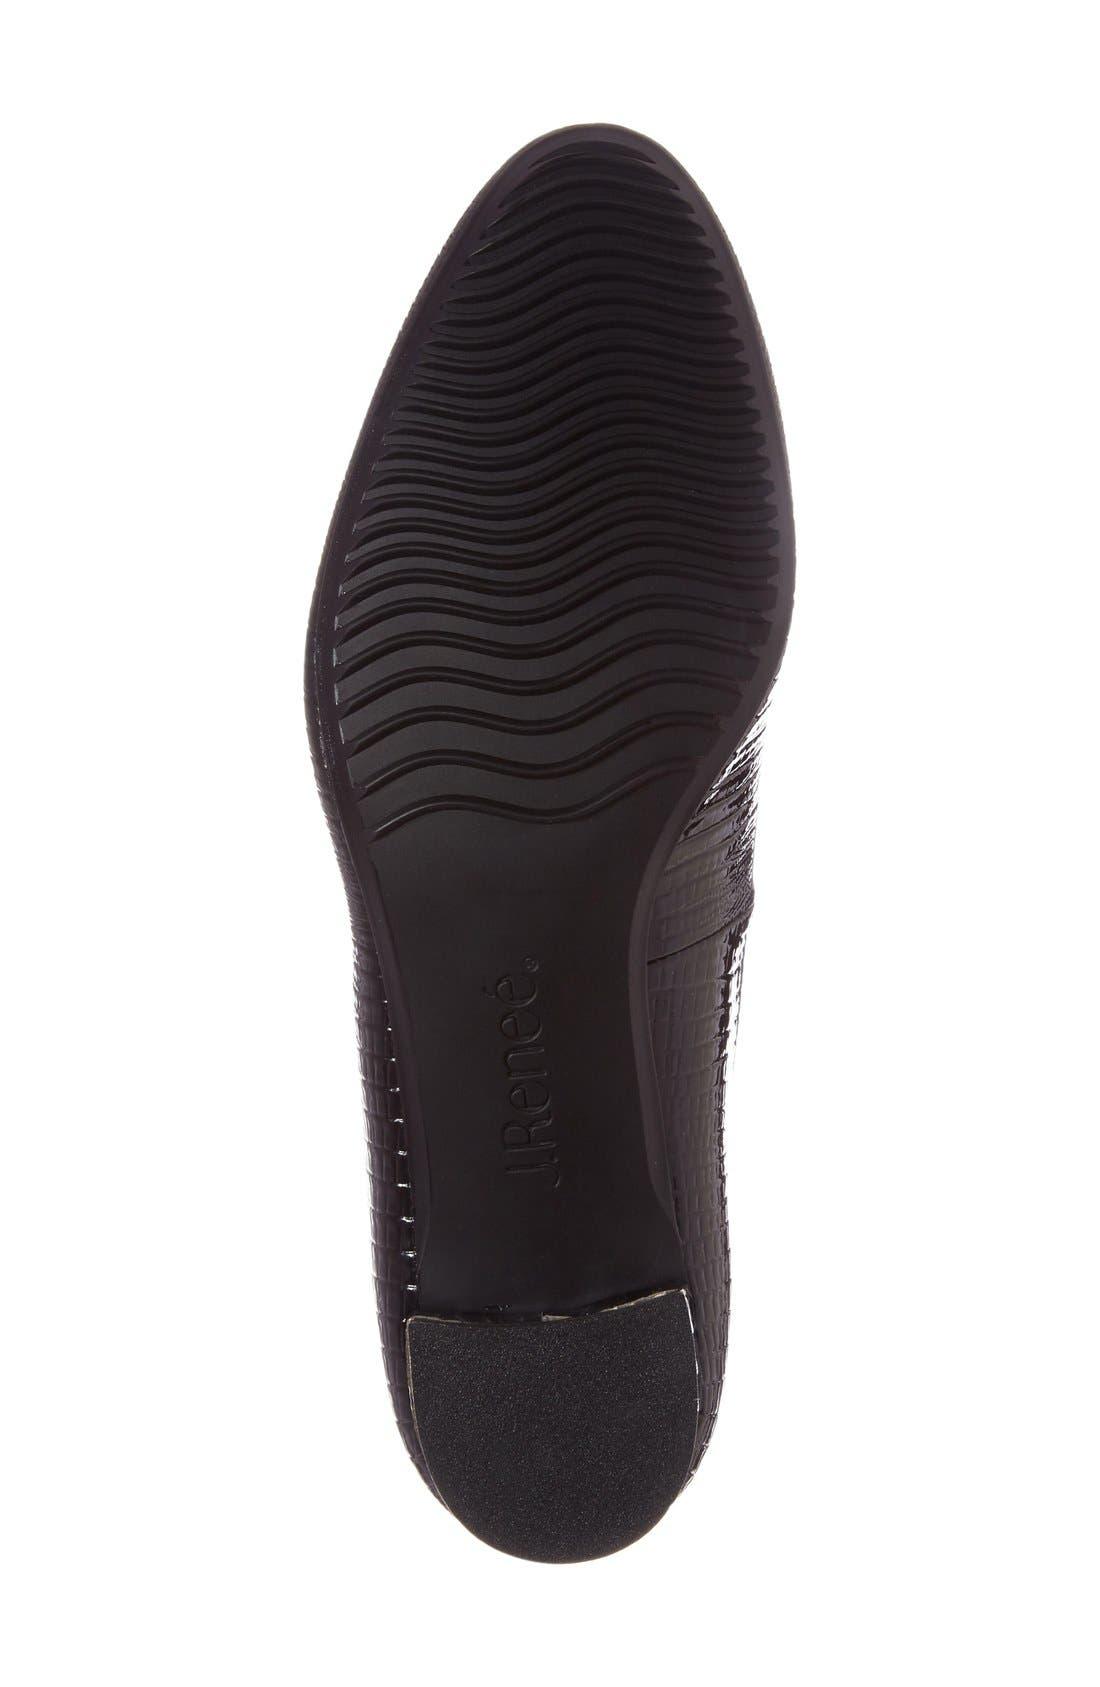 J. RENEÉ, Bambalina Block Heel Pump, Alternate thumbnail 4, color, BLACK FAUX LEATHER